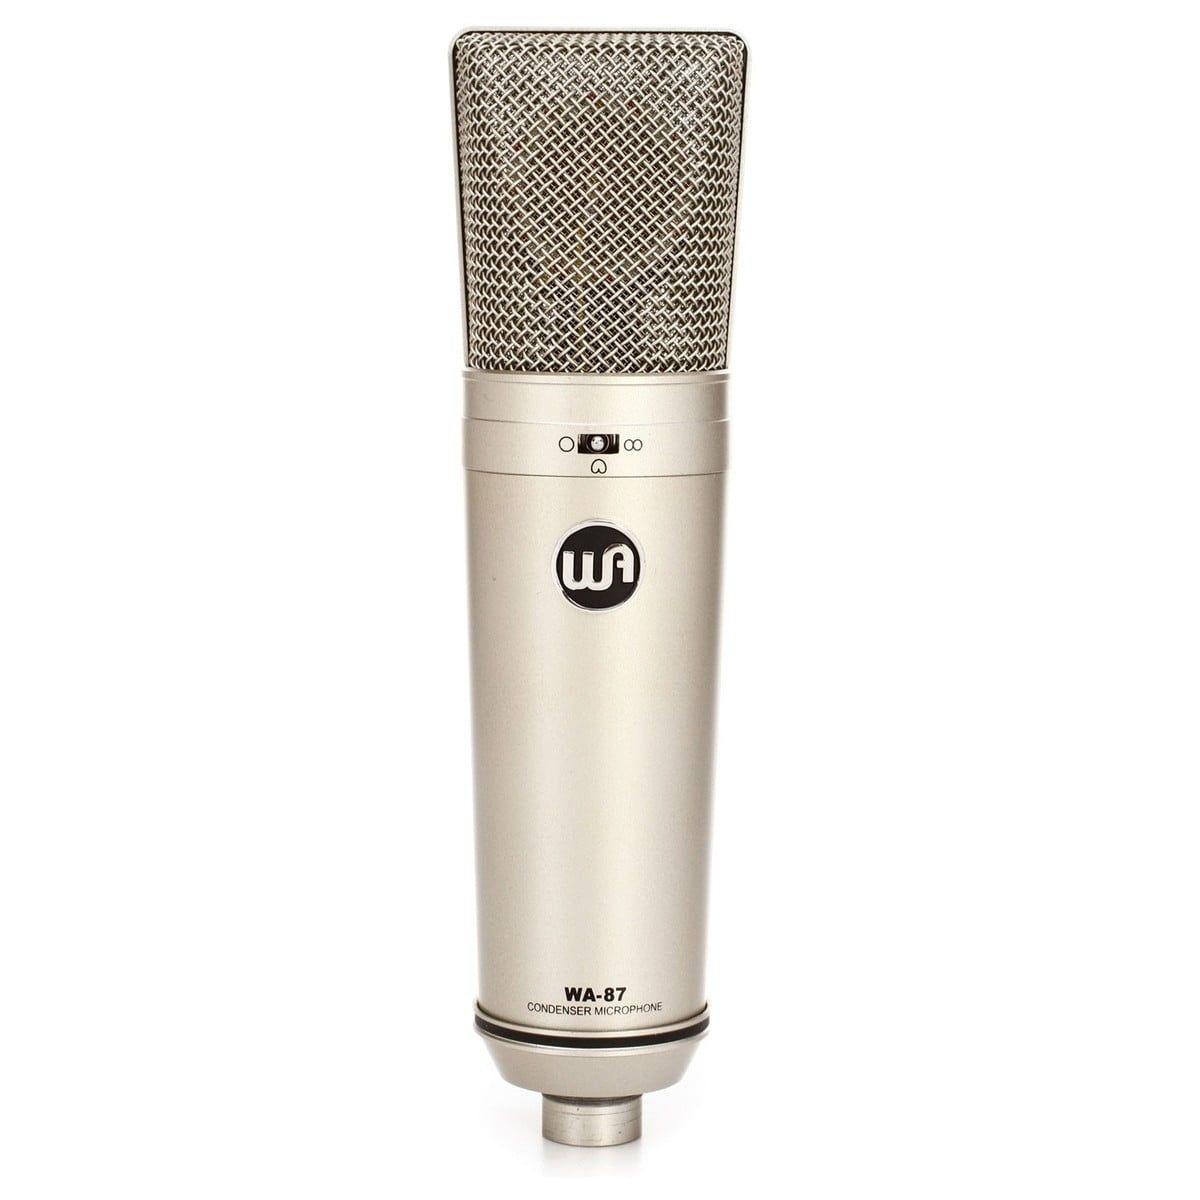 Warm Audio WA-87 Large-Diaphragm Condenser Mic